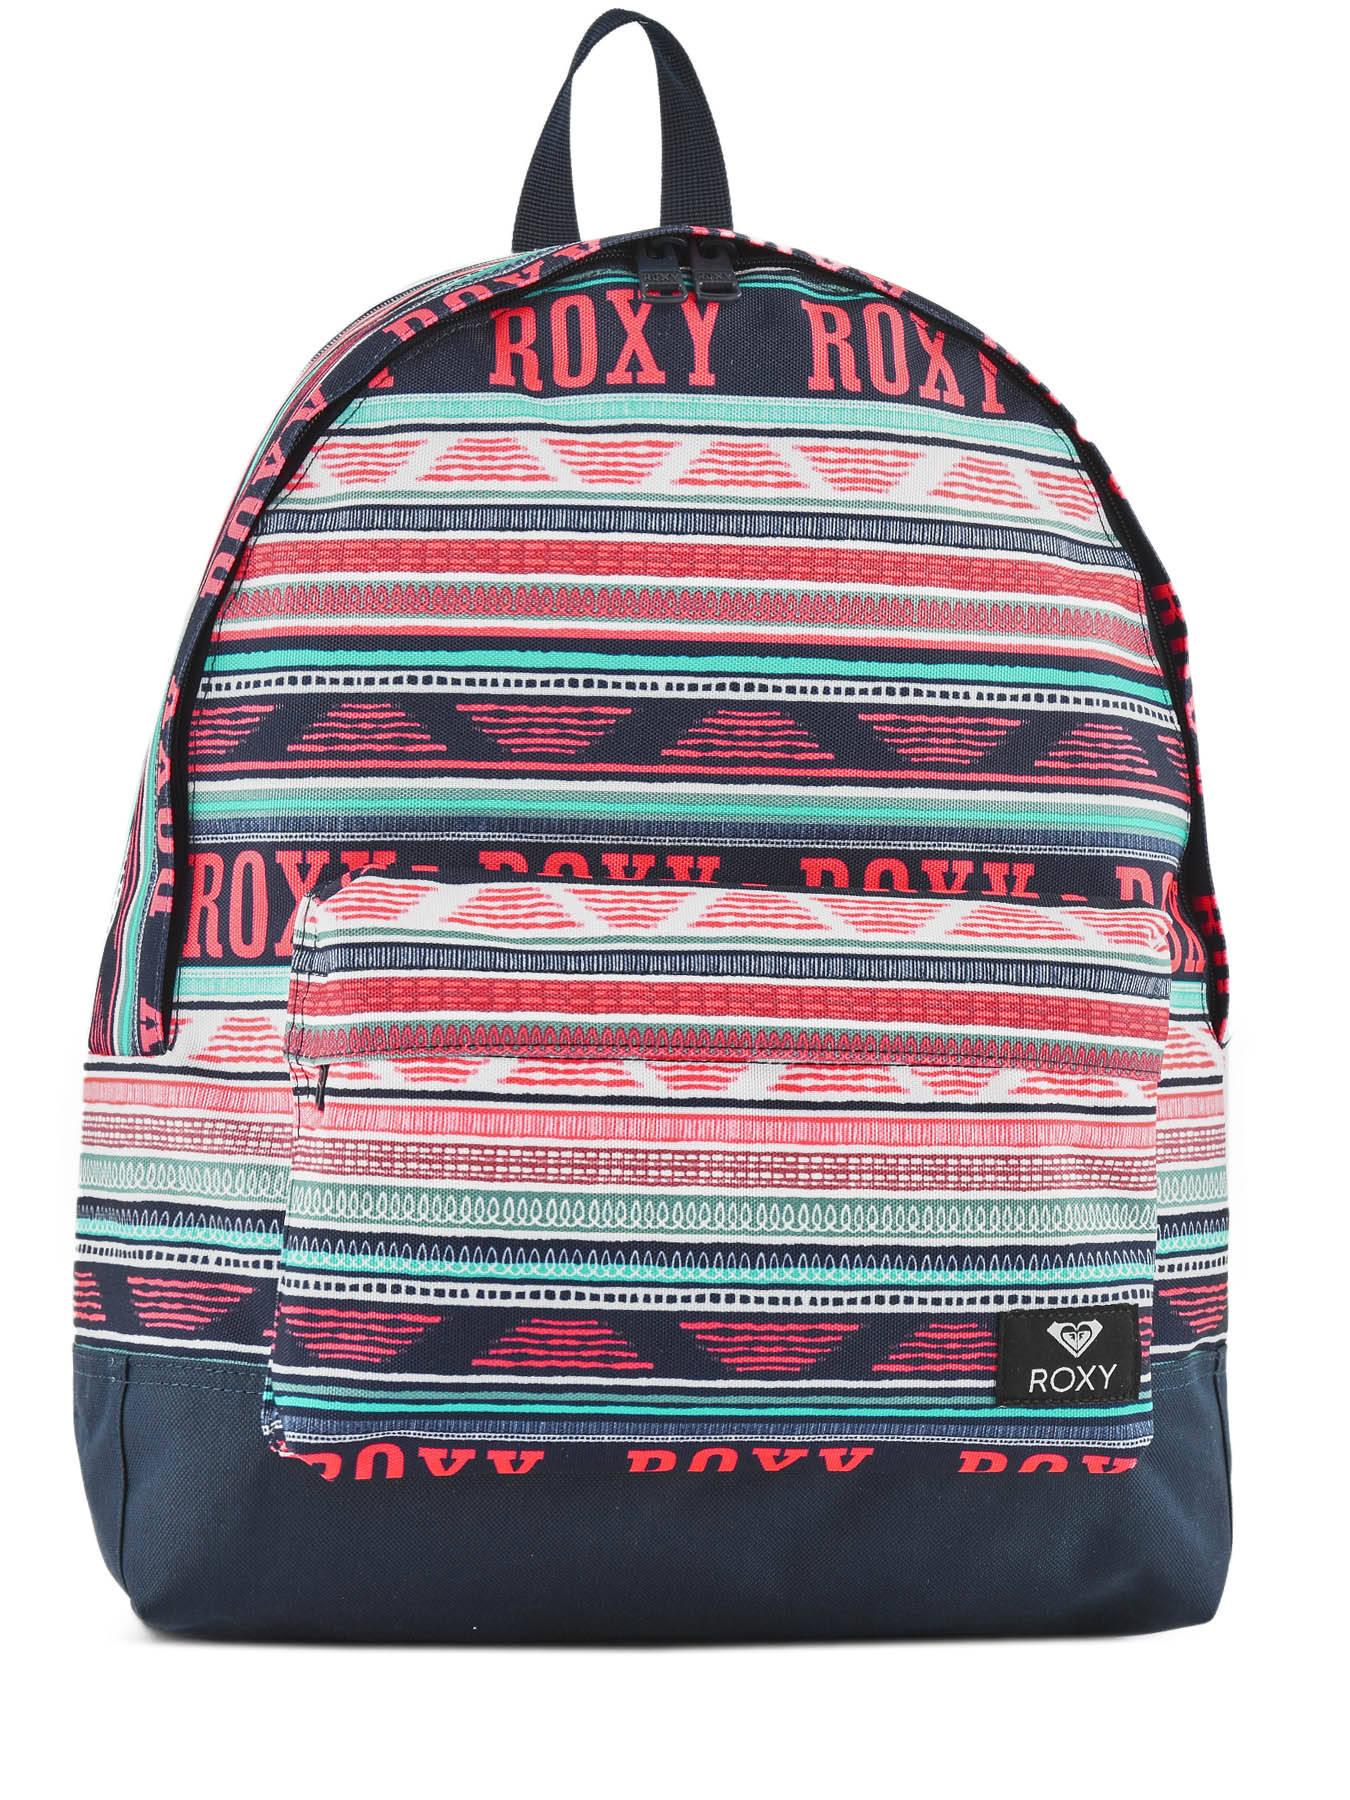 H18 sugar Prix Open Roxy Meilleur Vente À Sac En Baby Au White Dos BroeCxd